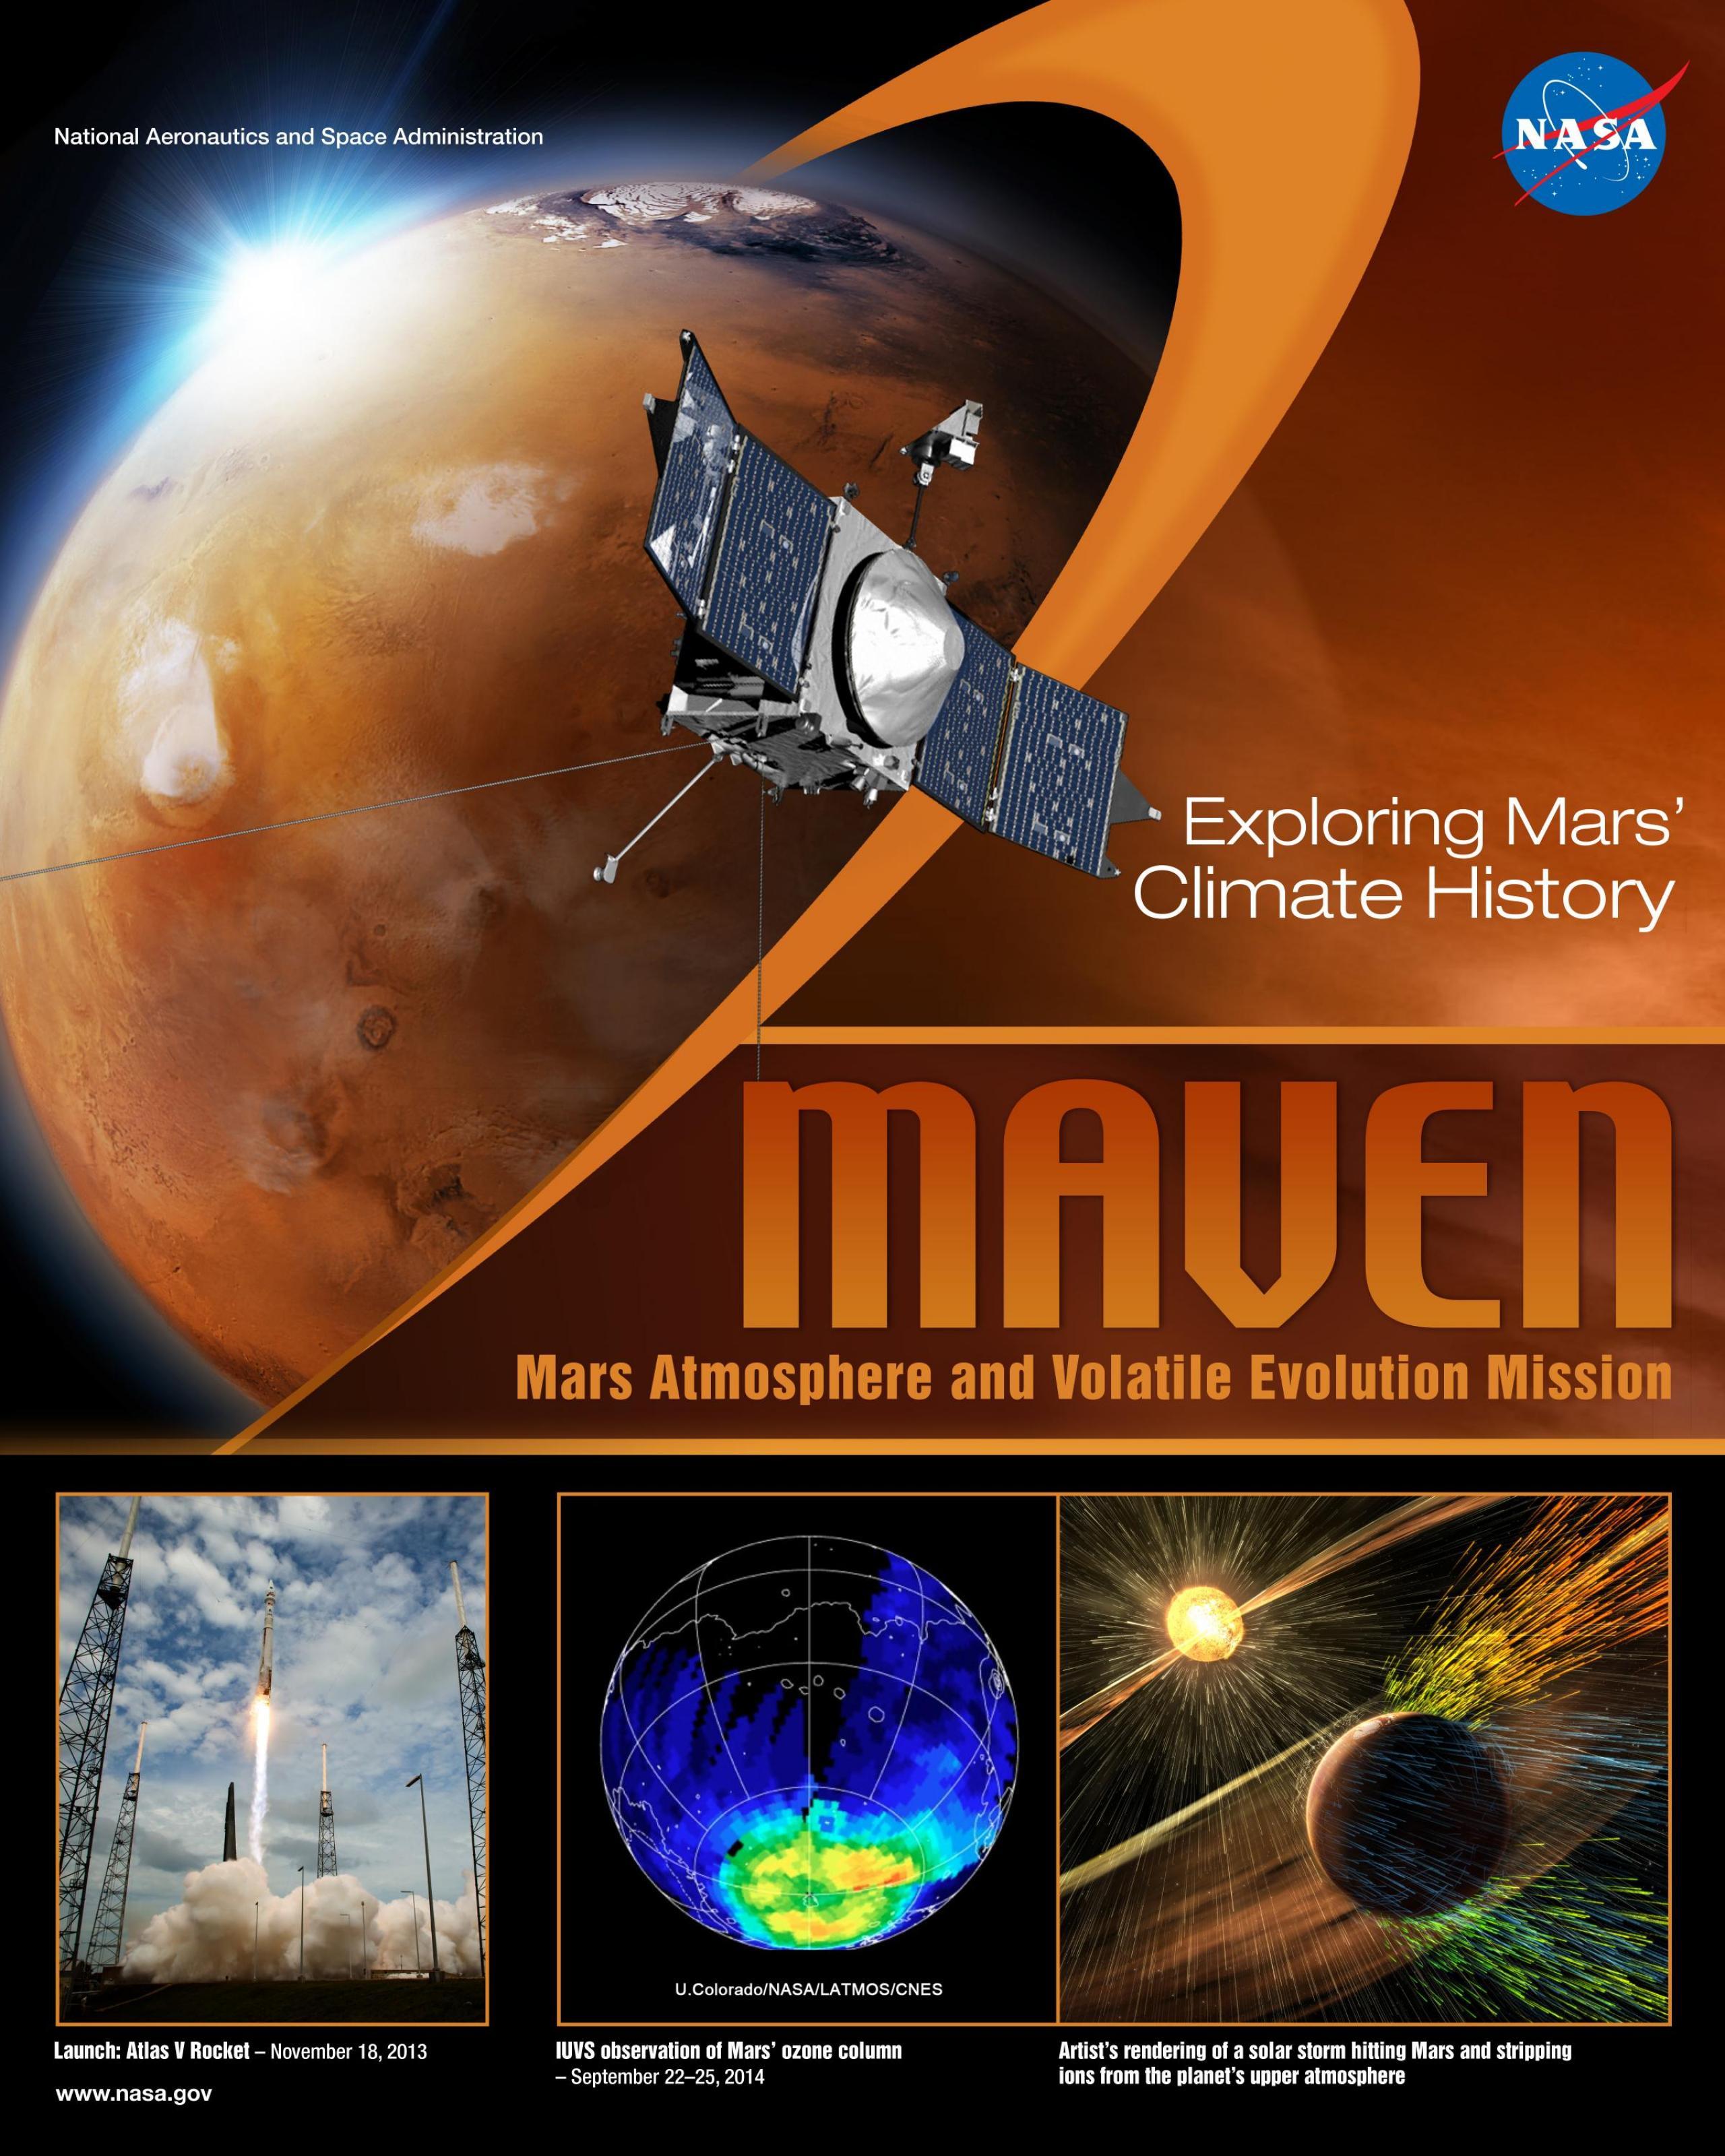 MAVEN.jpg